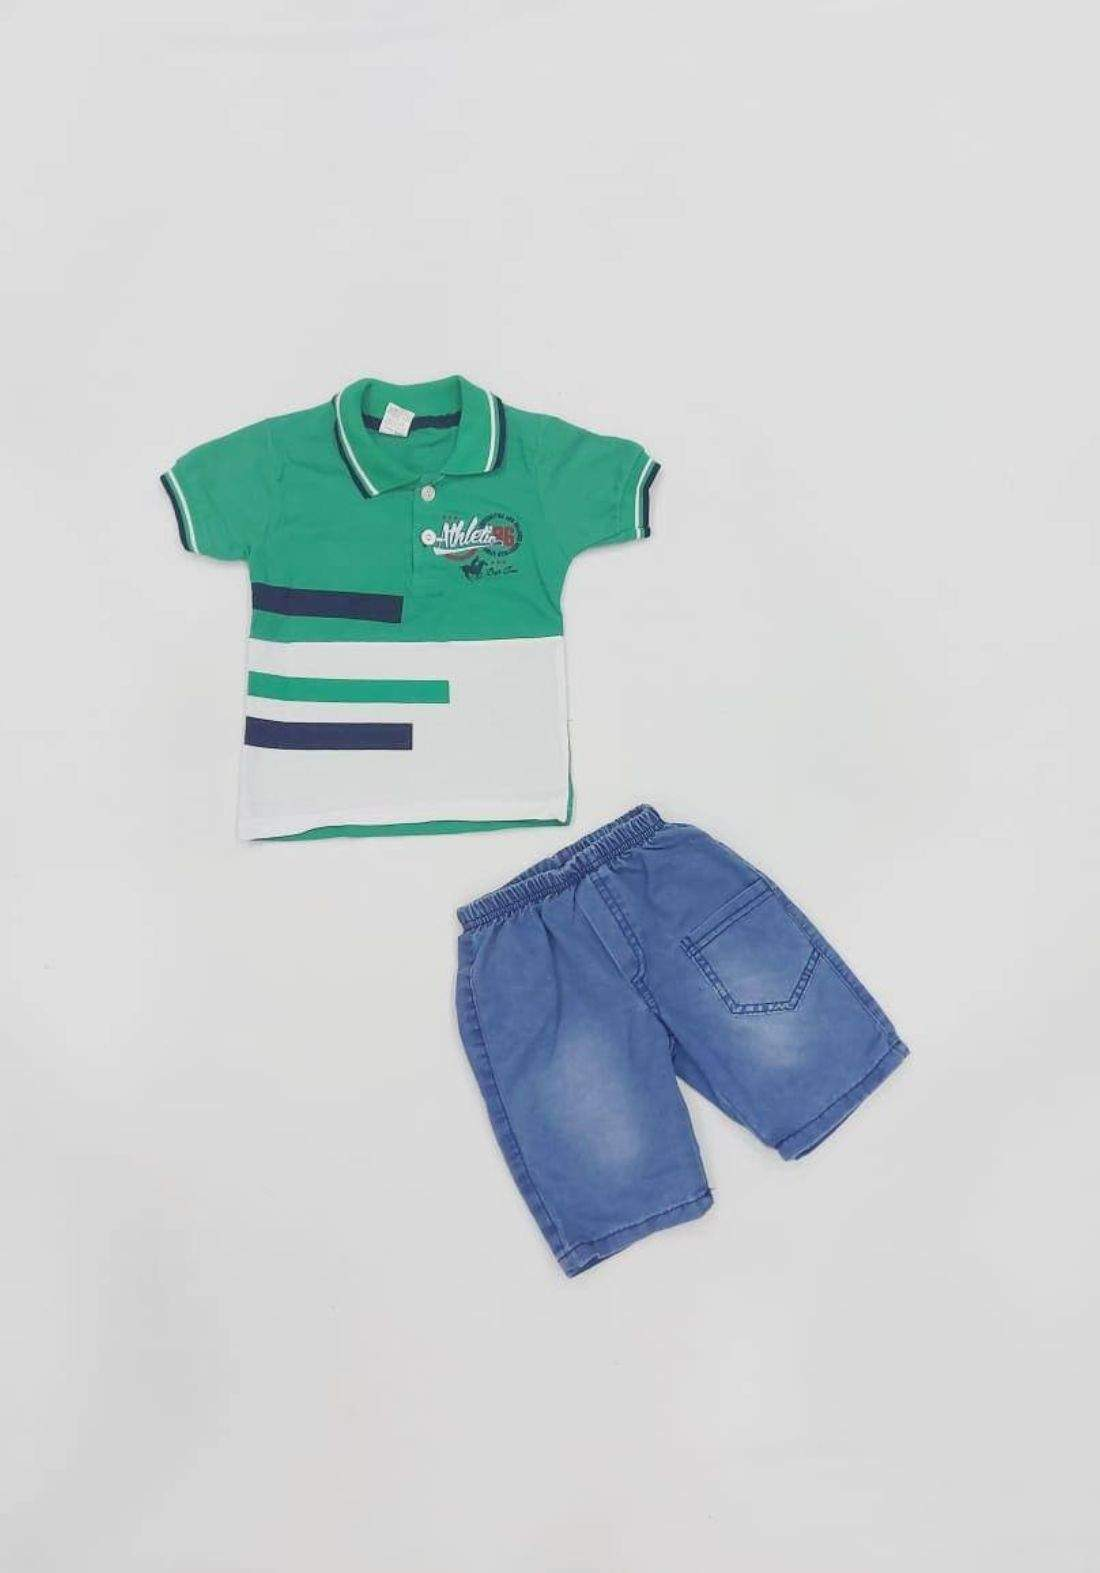 طقم ولادي اخضر (قميص وشورت )